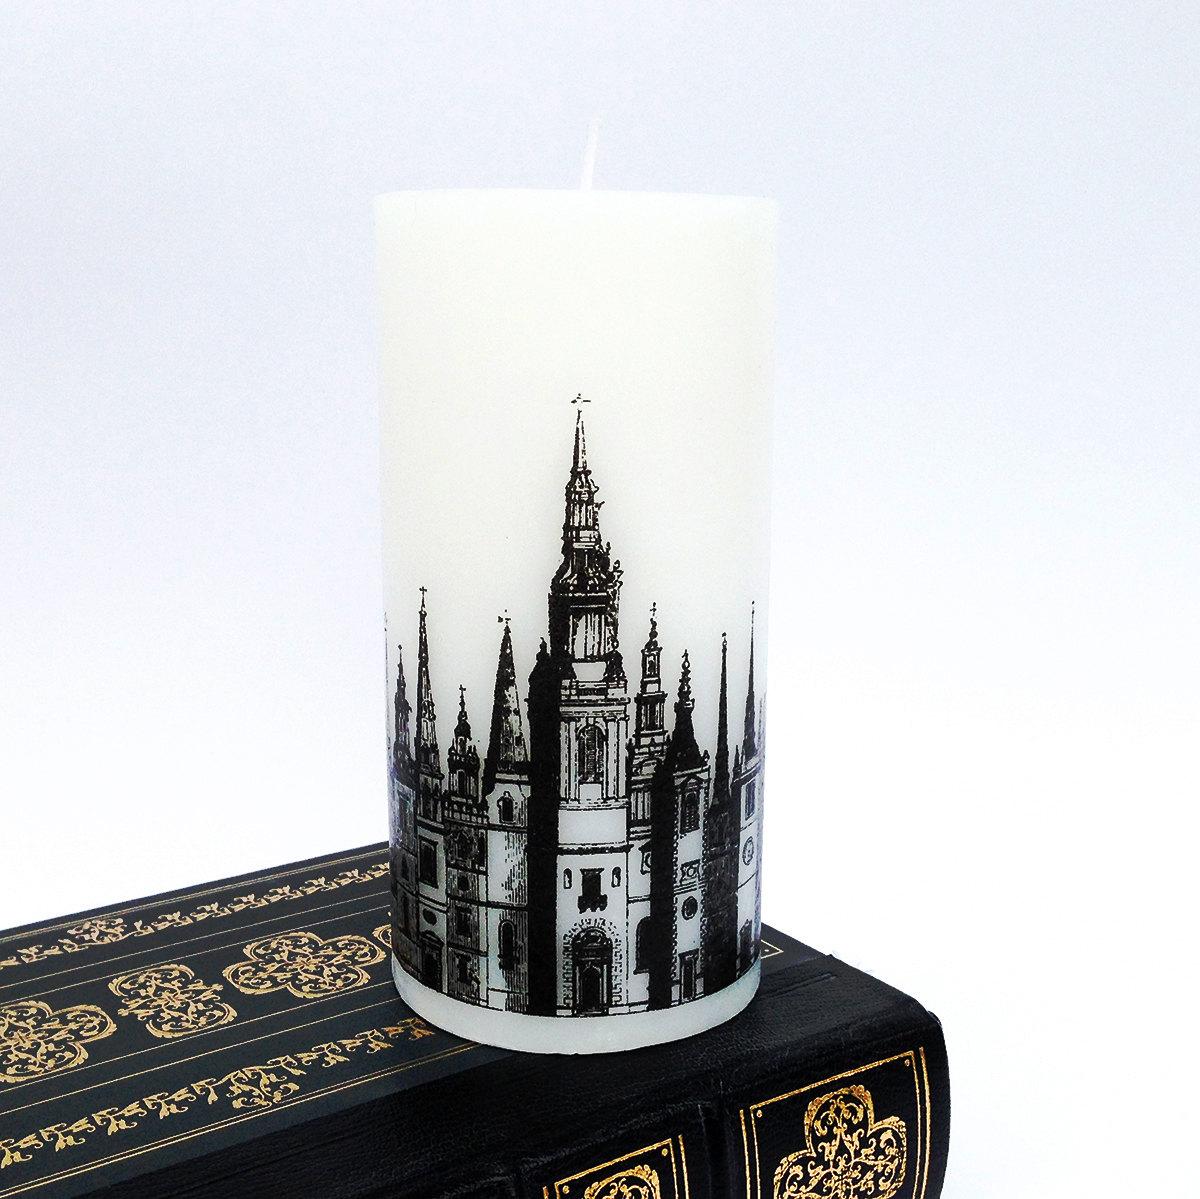 Gothic Spires Black White Candle Victorian London Skyline